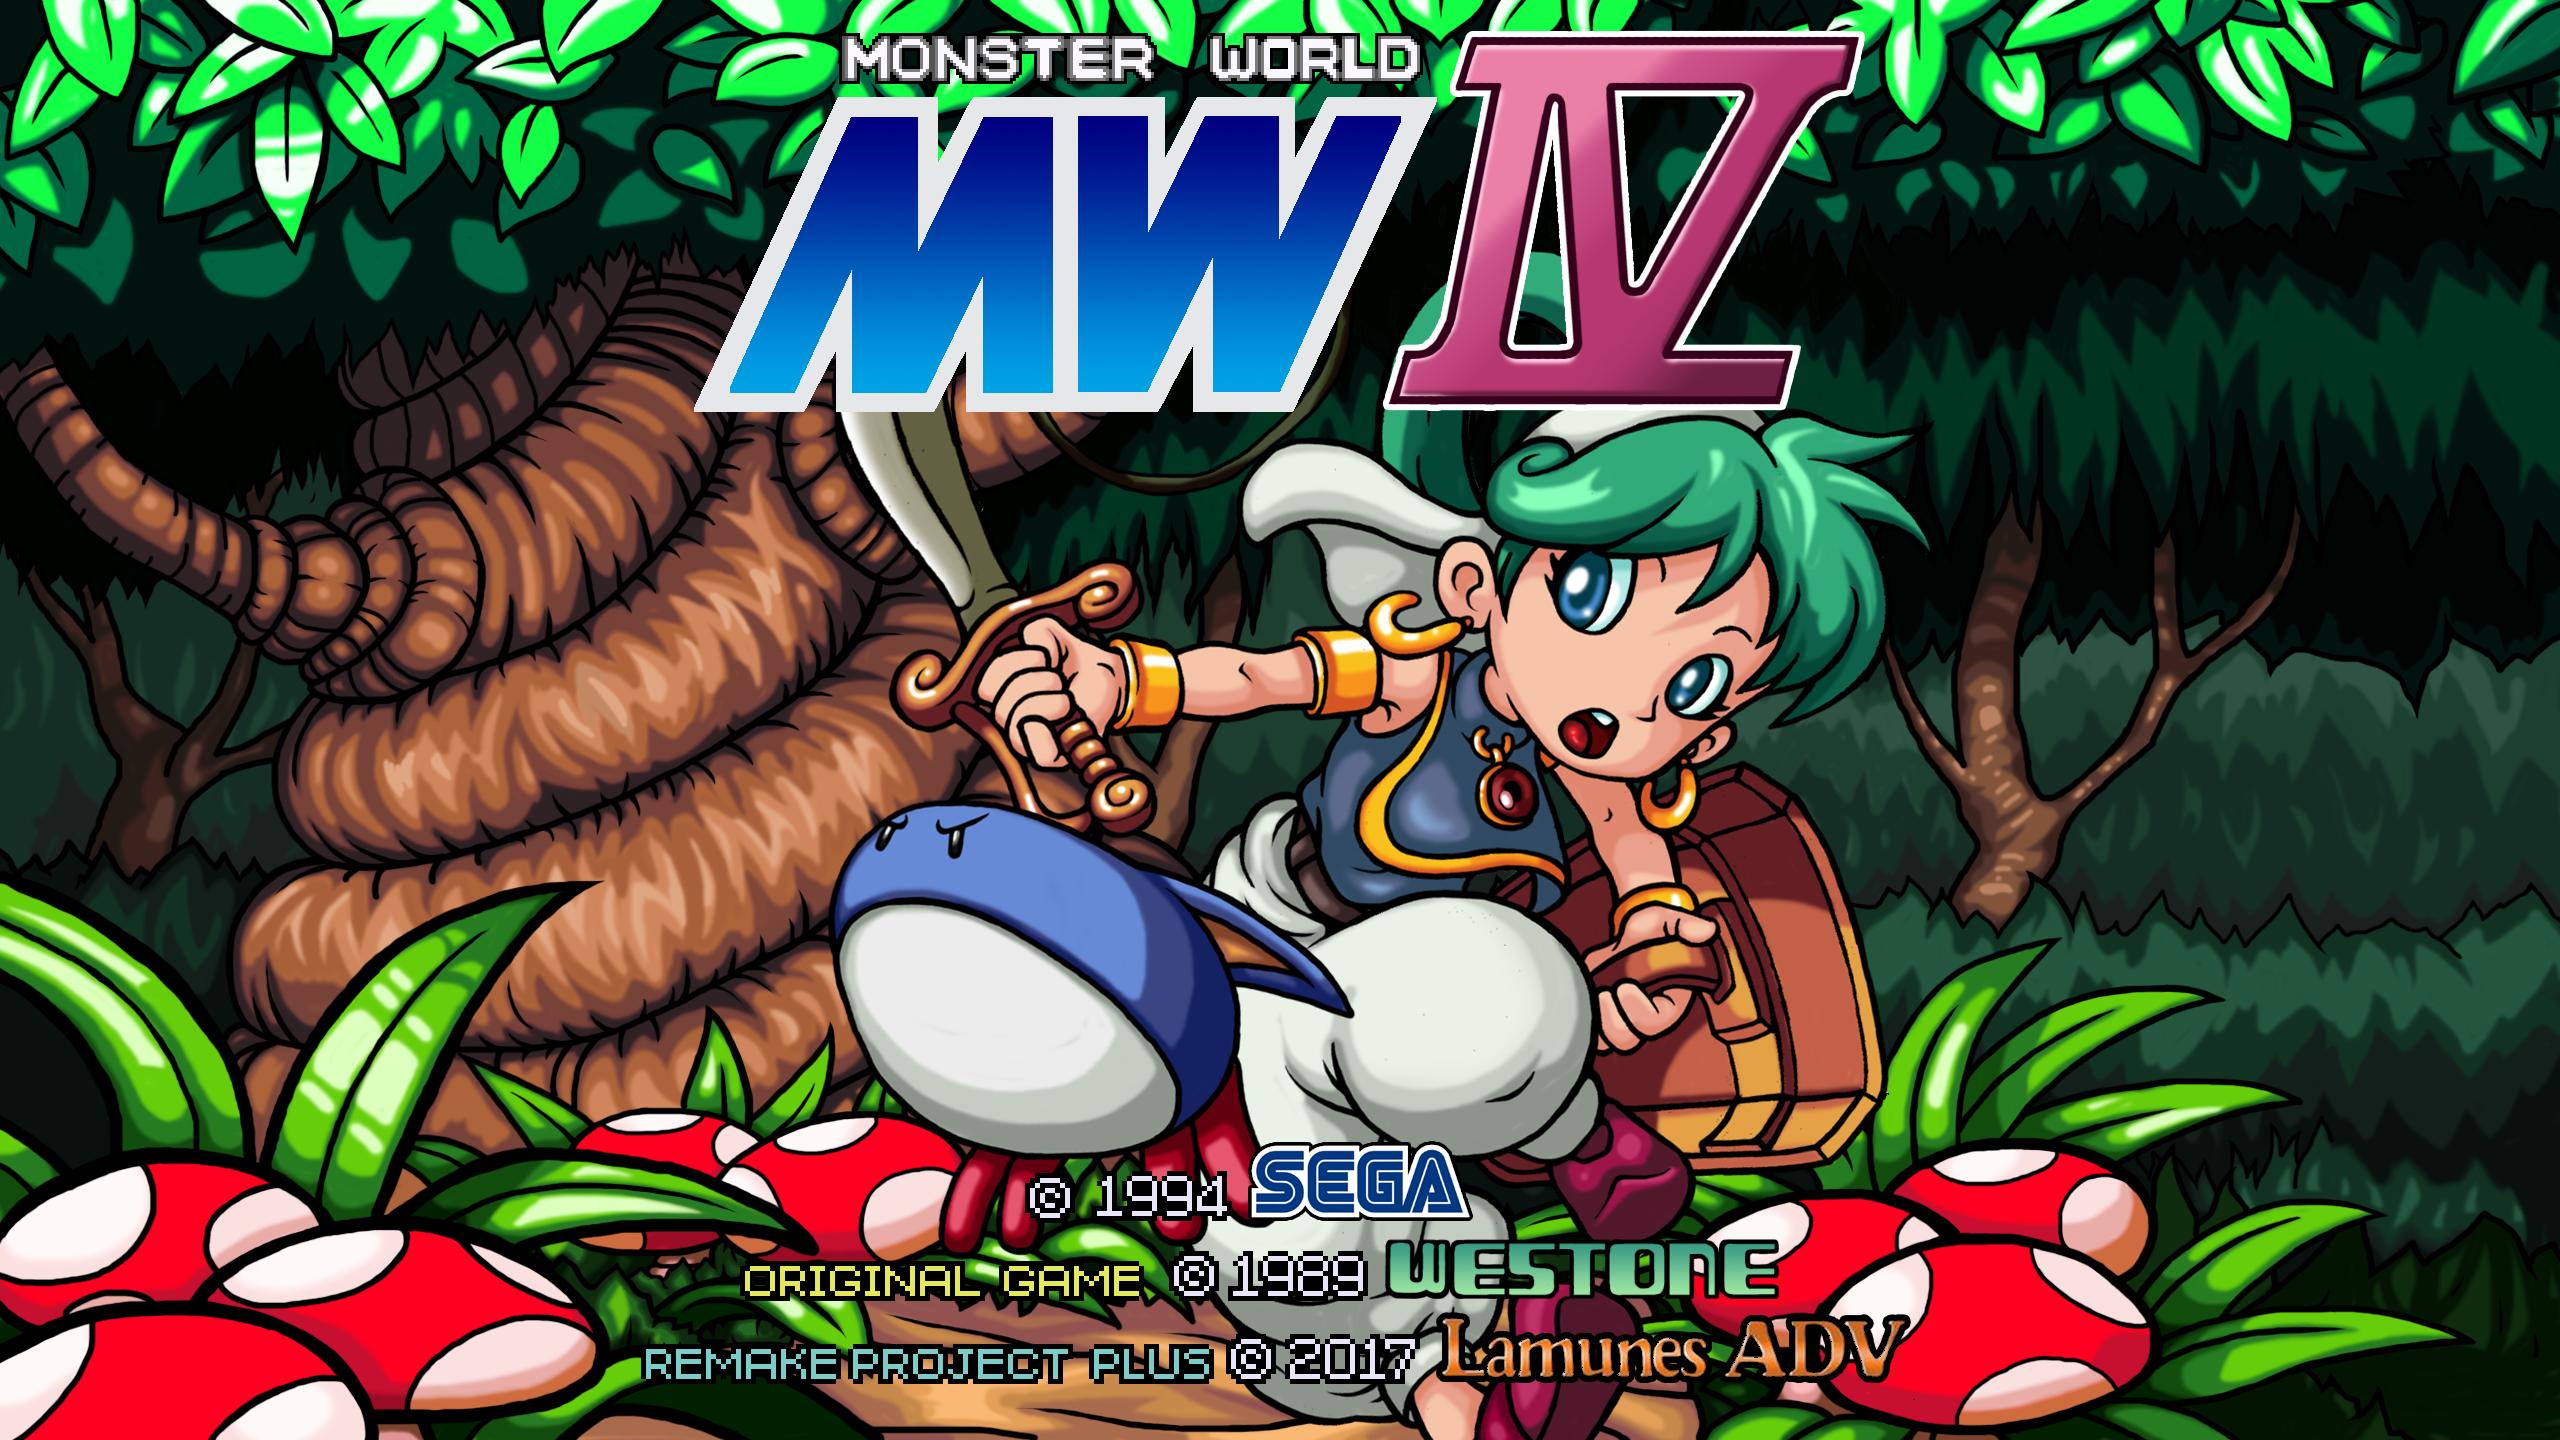 Remake Project + - Monster World IV